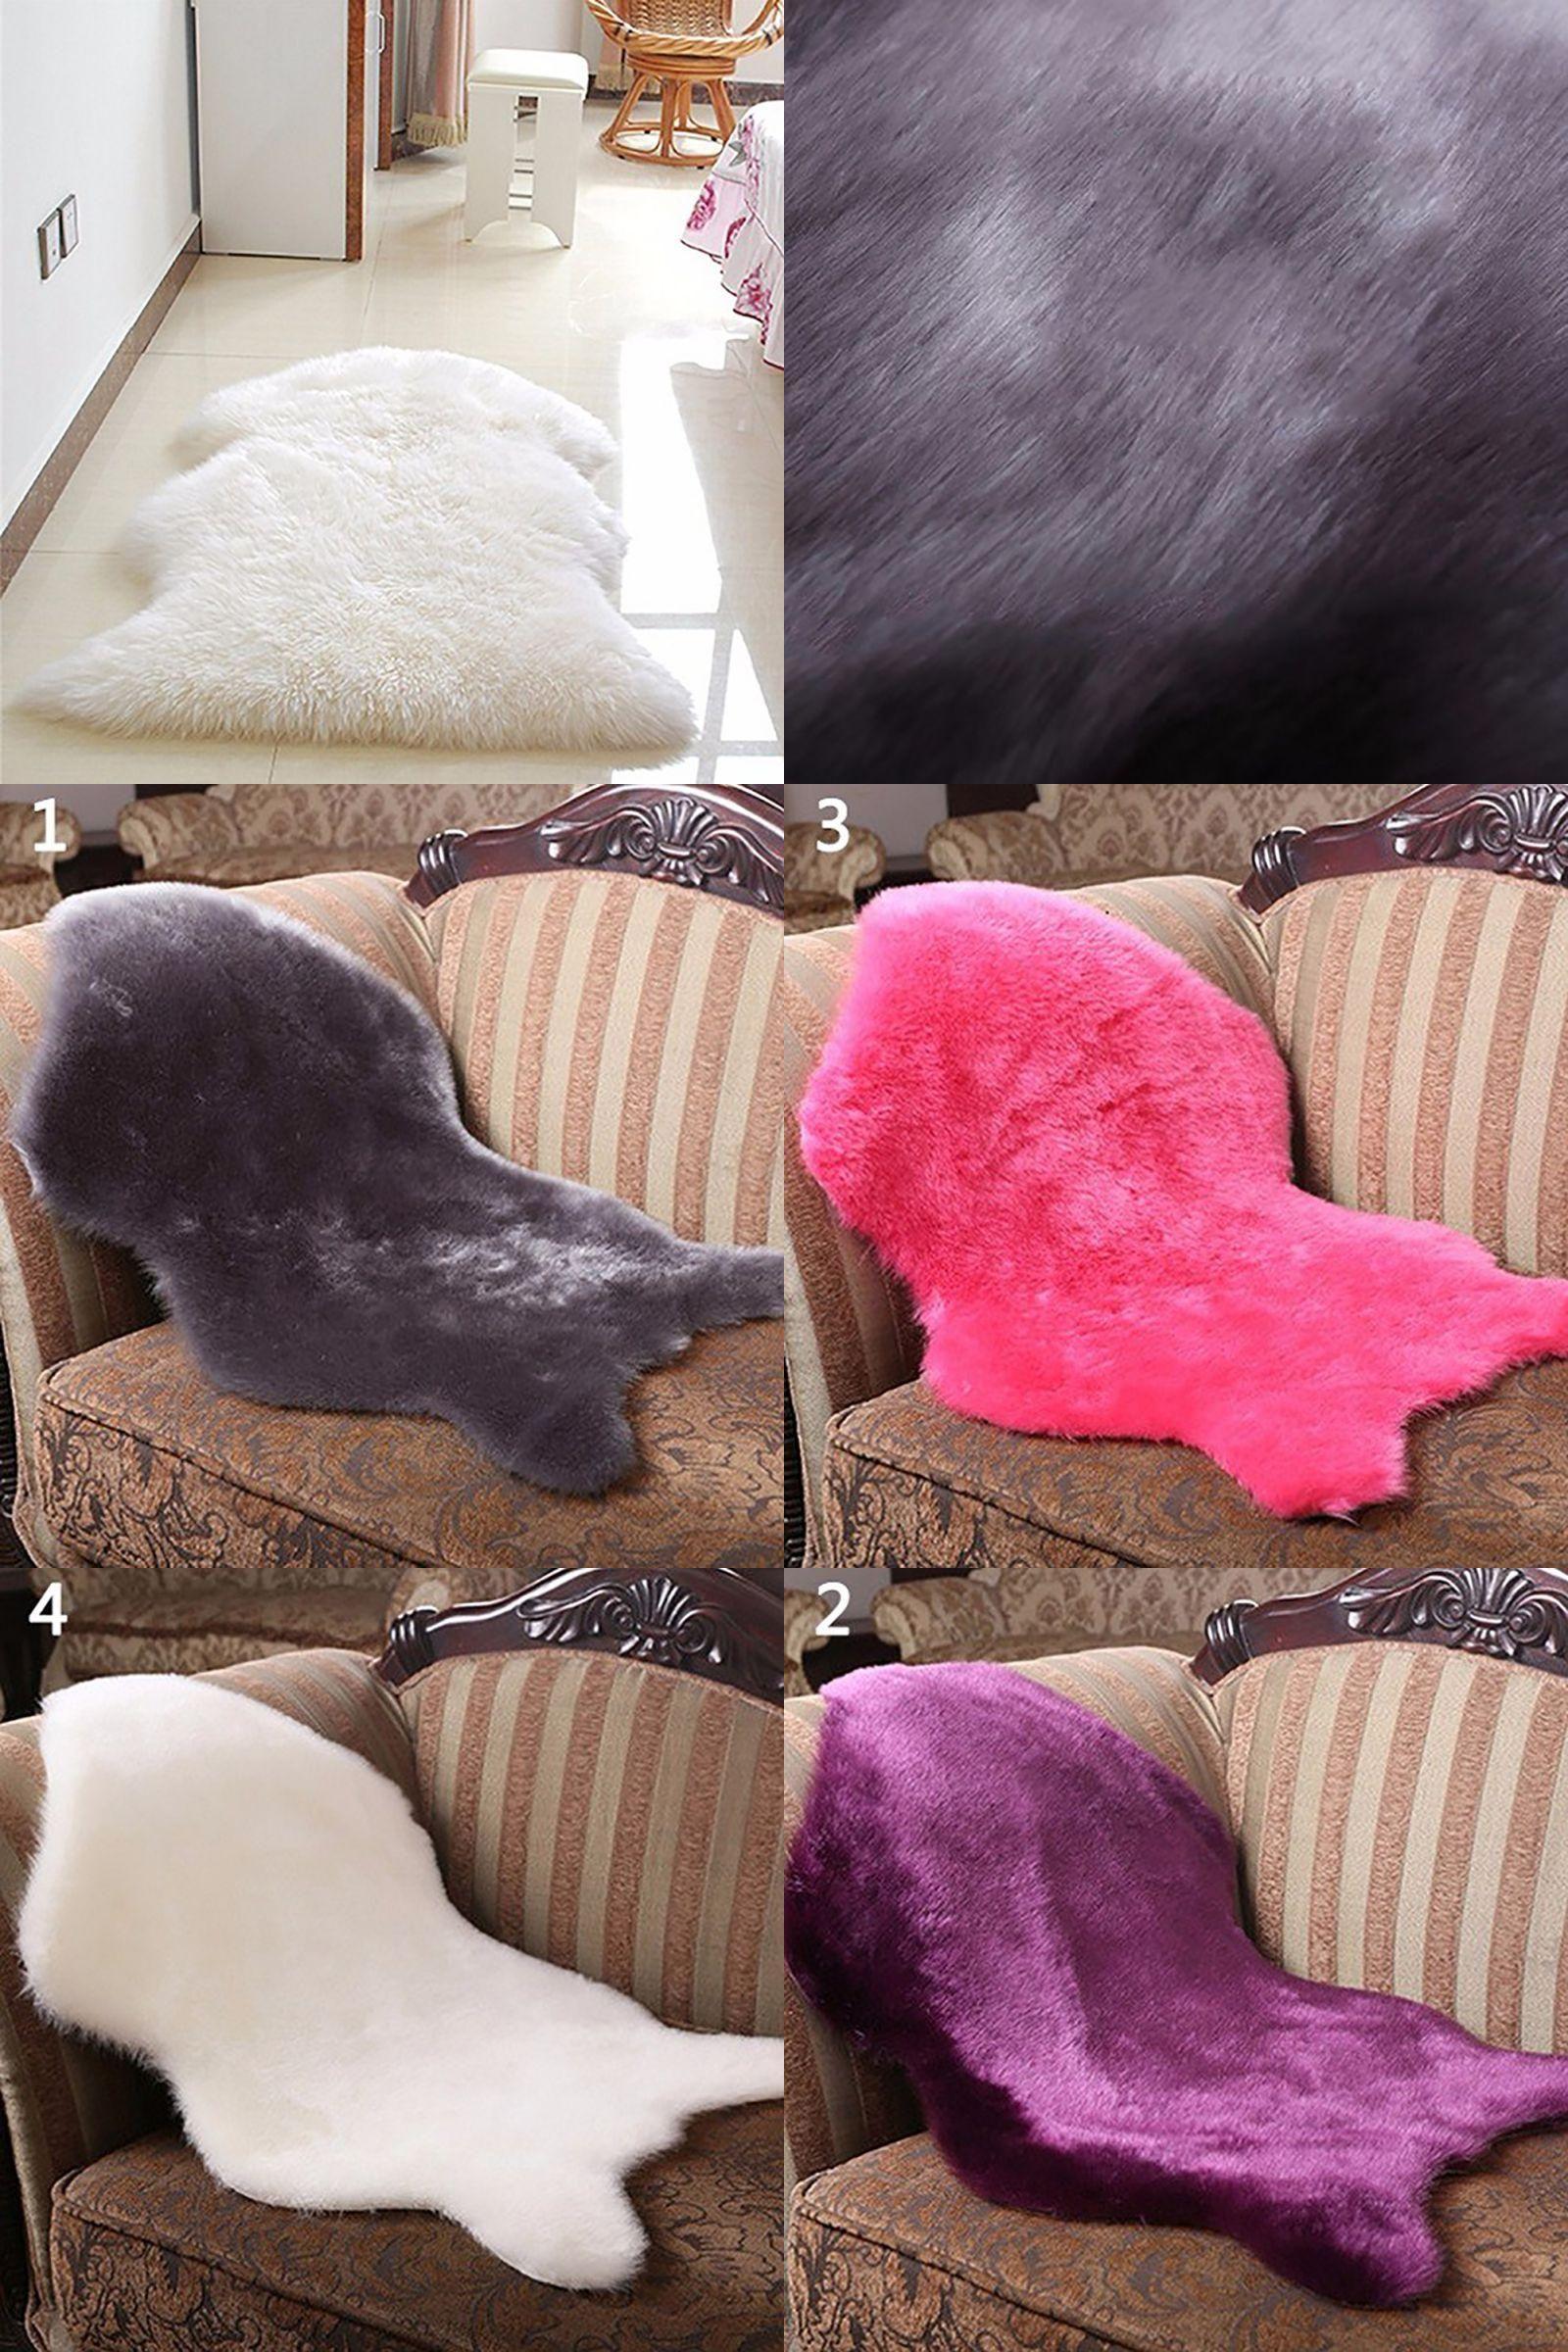 Visit to Buy] Newest Soft Faux Sheepskin Rug Mat Carpet Pad Anti